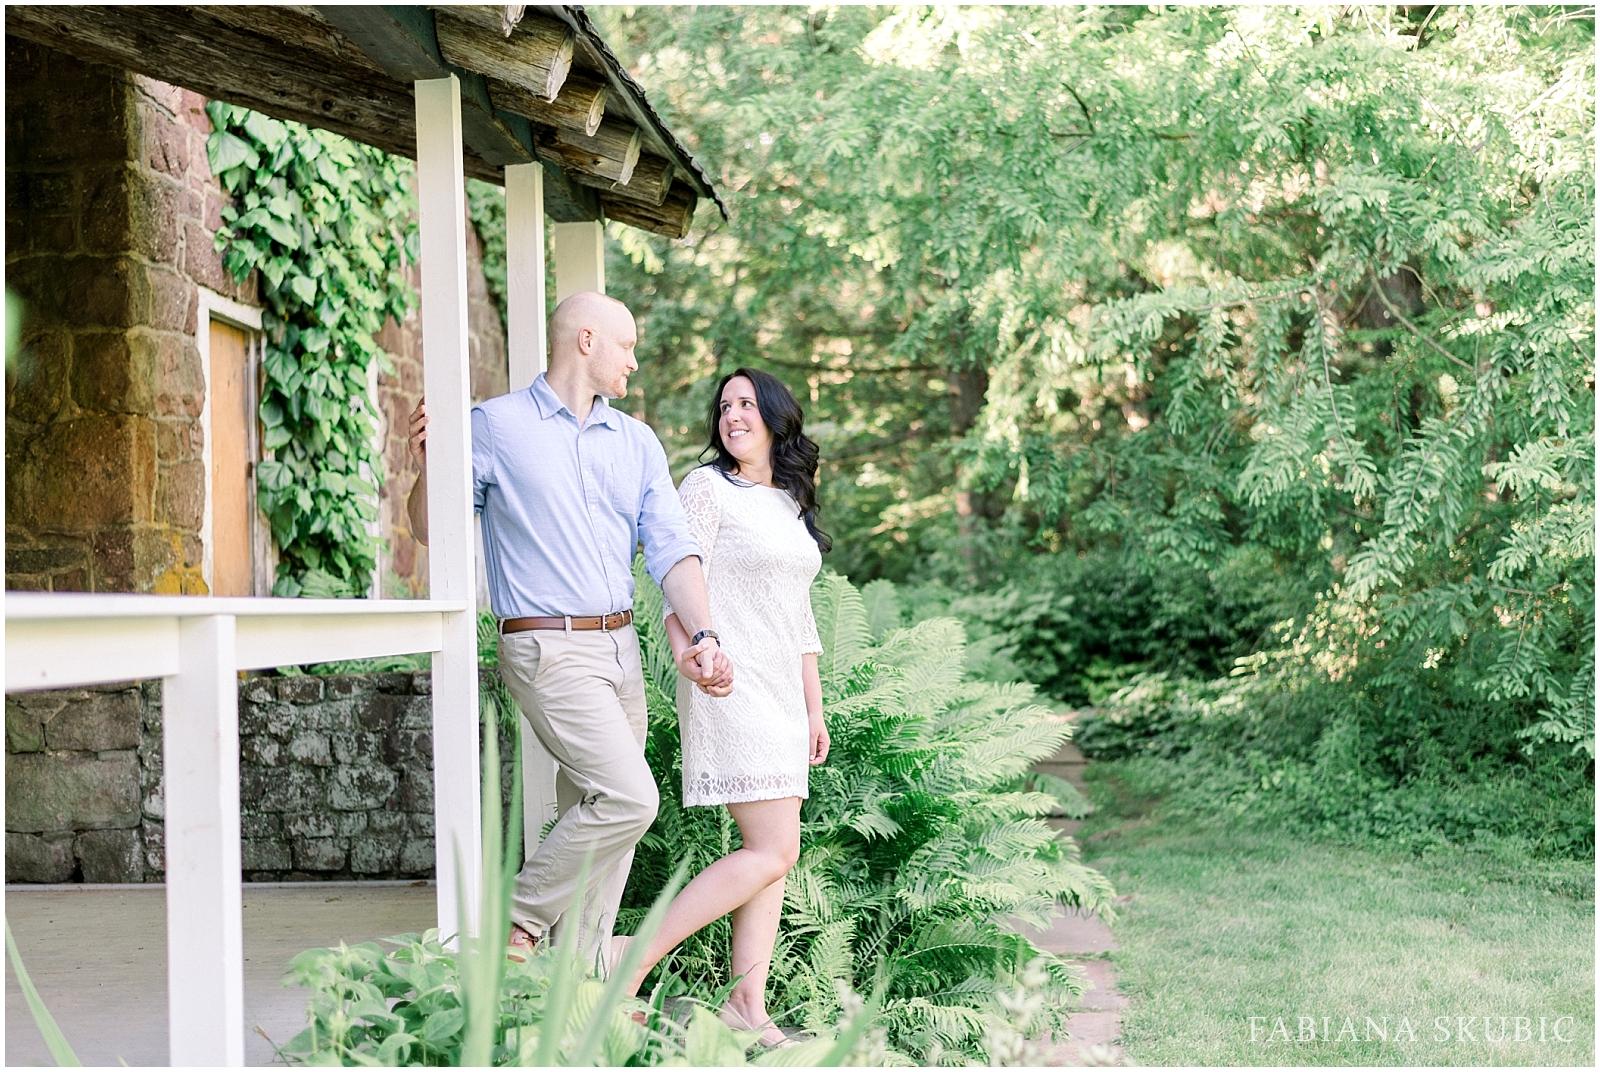 N&J_Engagement_Willowwood_Arboretum_0002.jpg